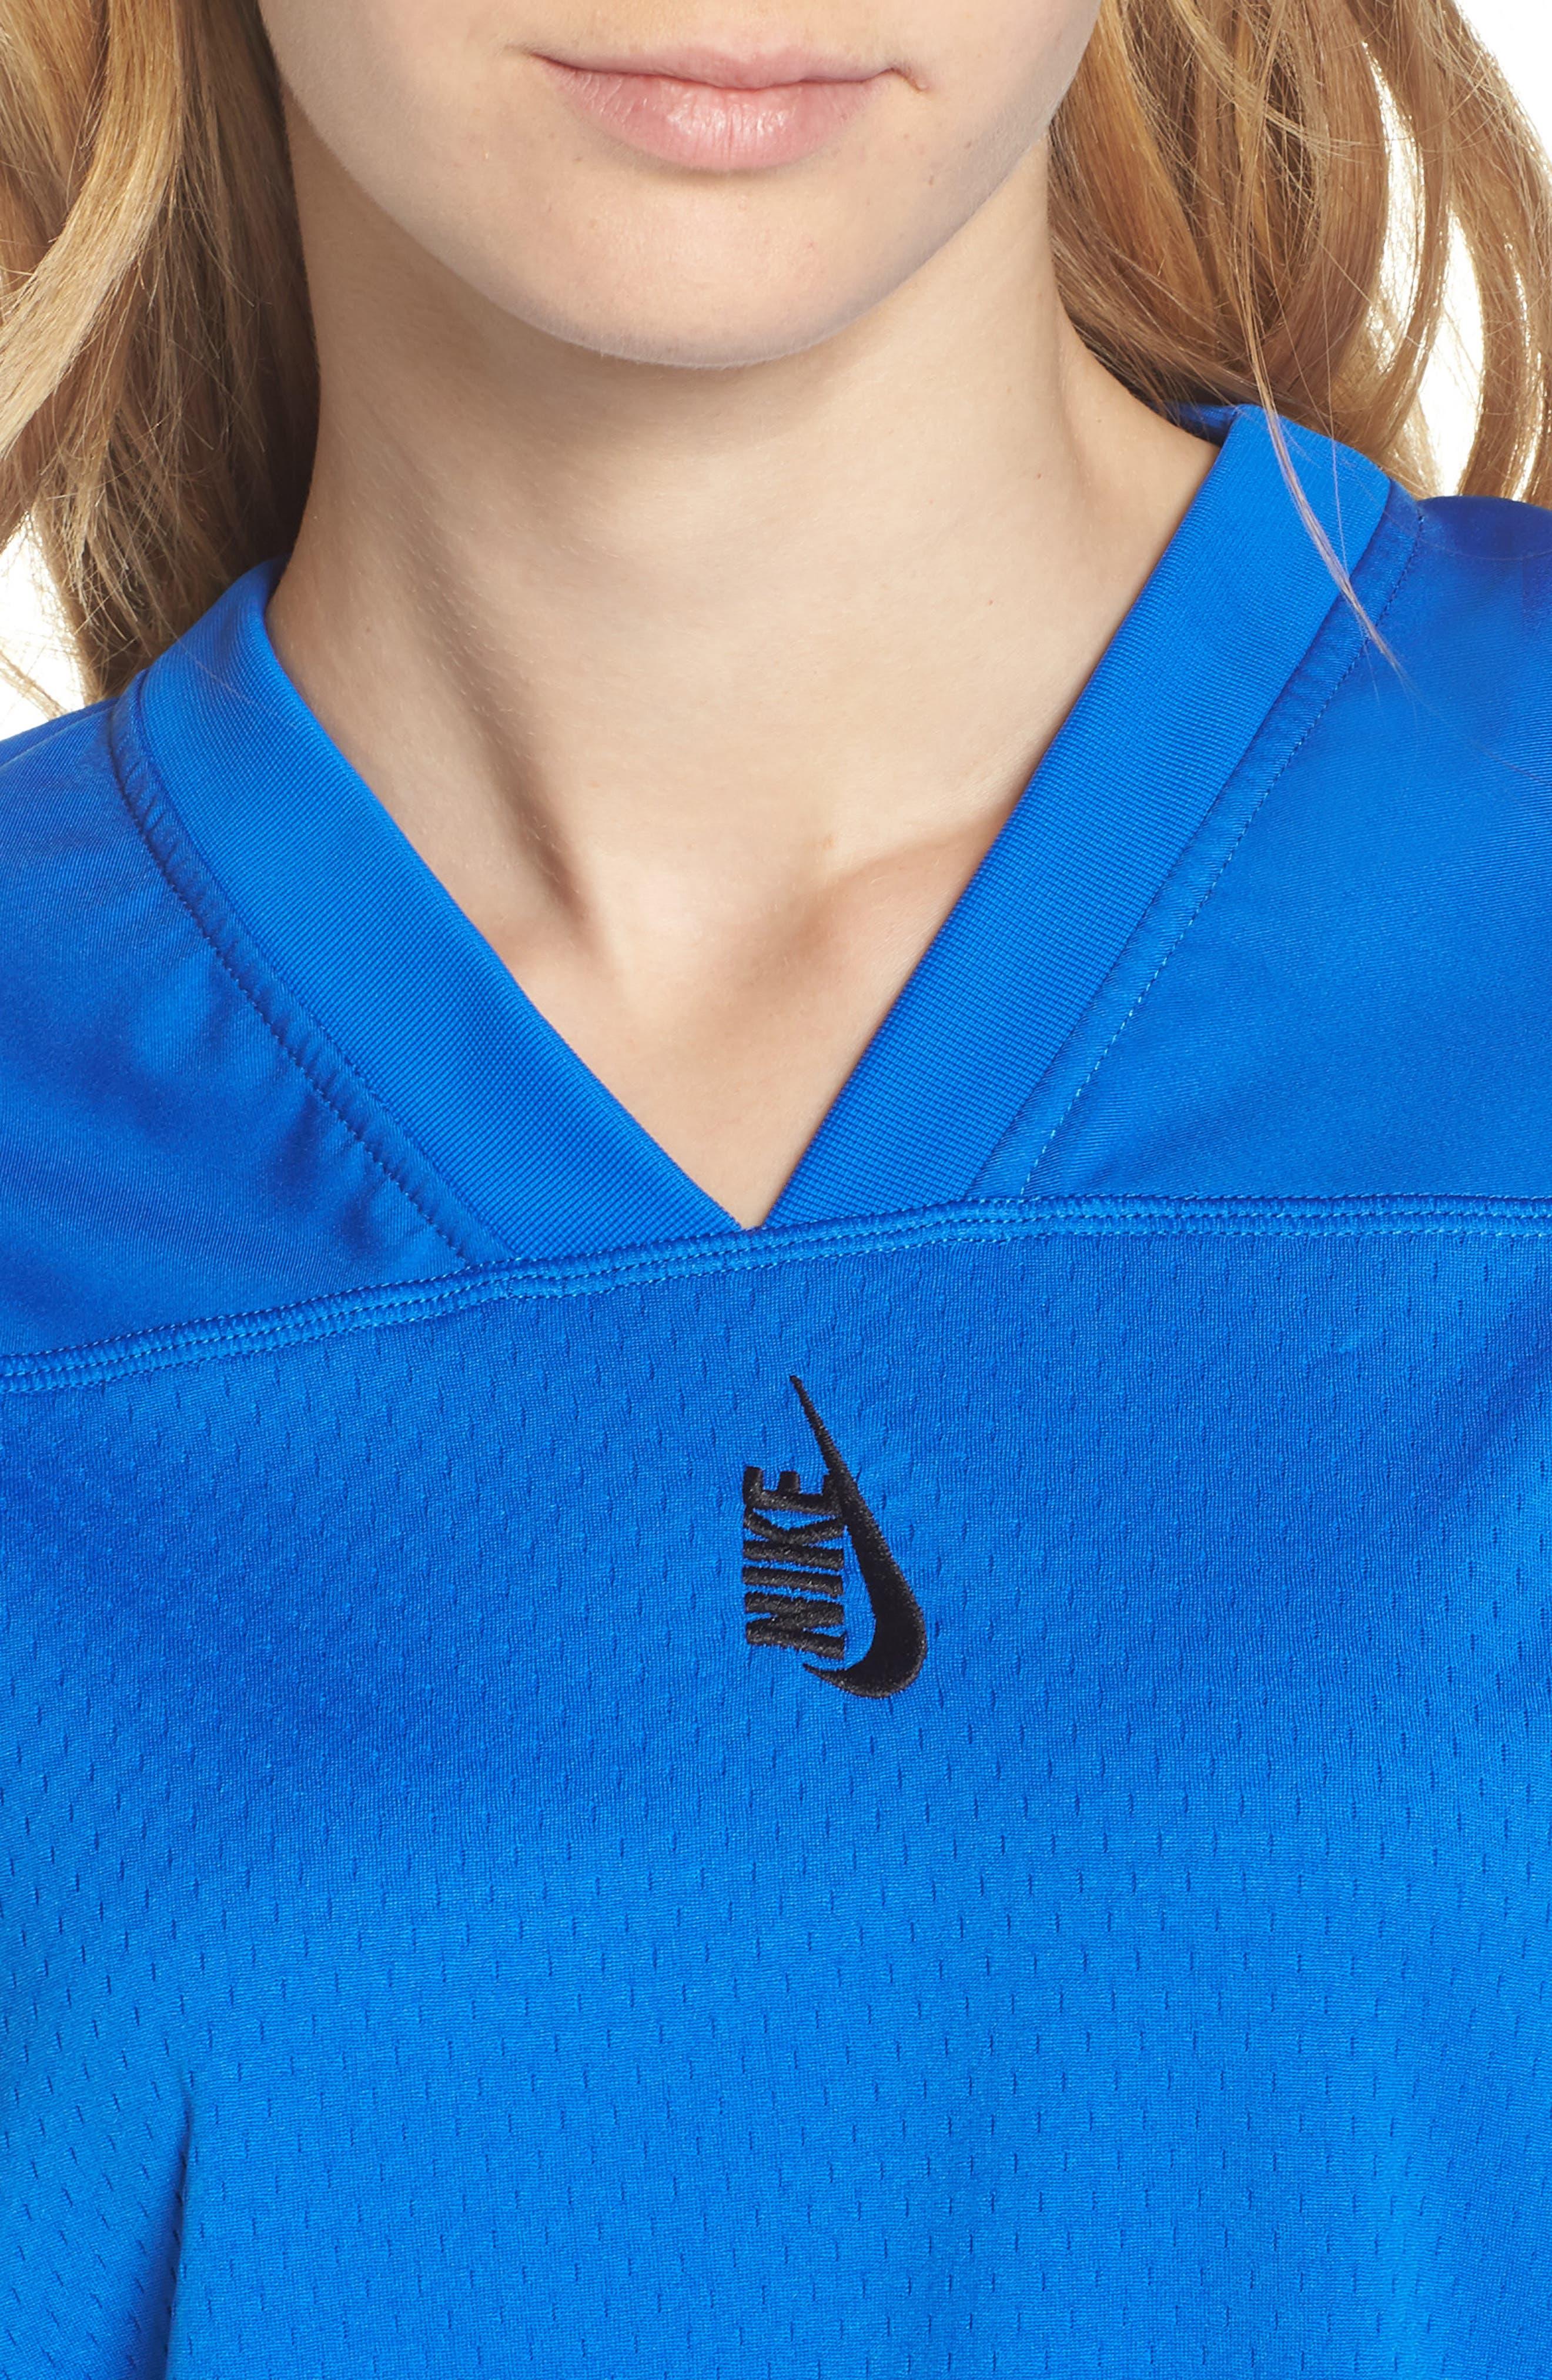 NikeLab Collection Football Top,                             Alternate thumbnail 4, color,                             Hyper Cobalt/ Black